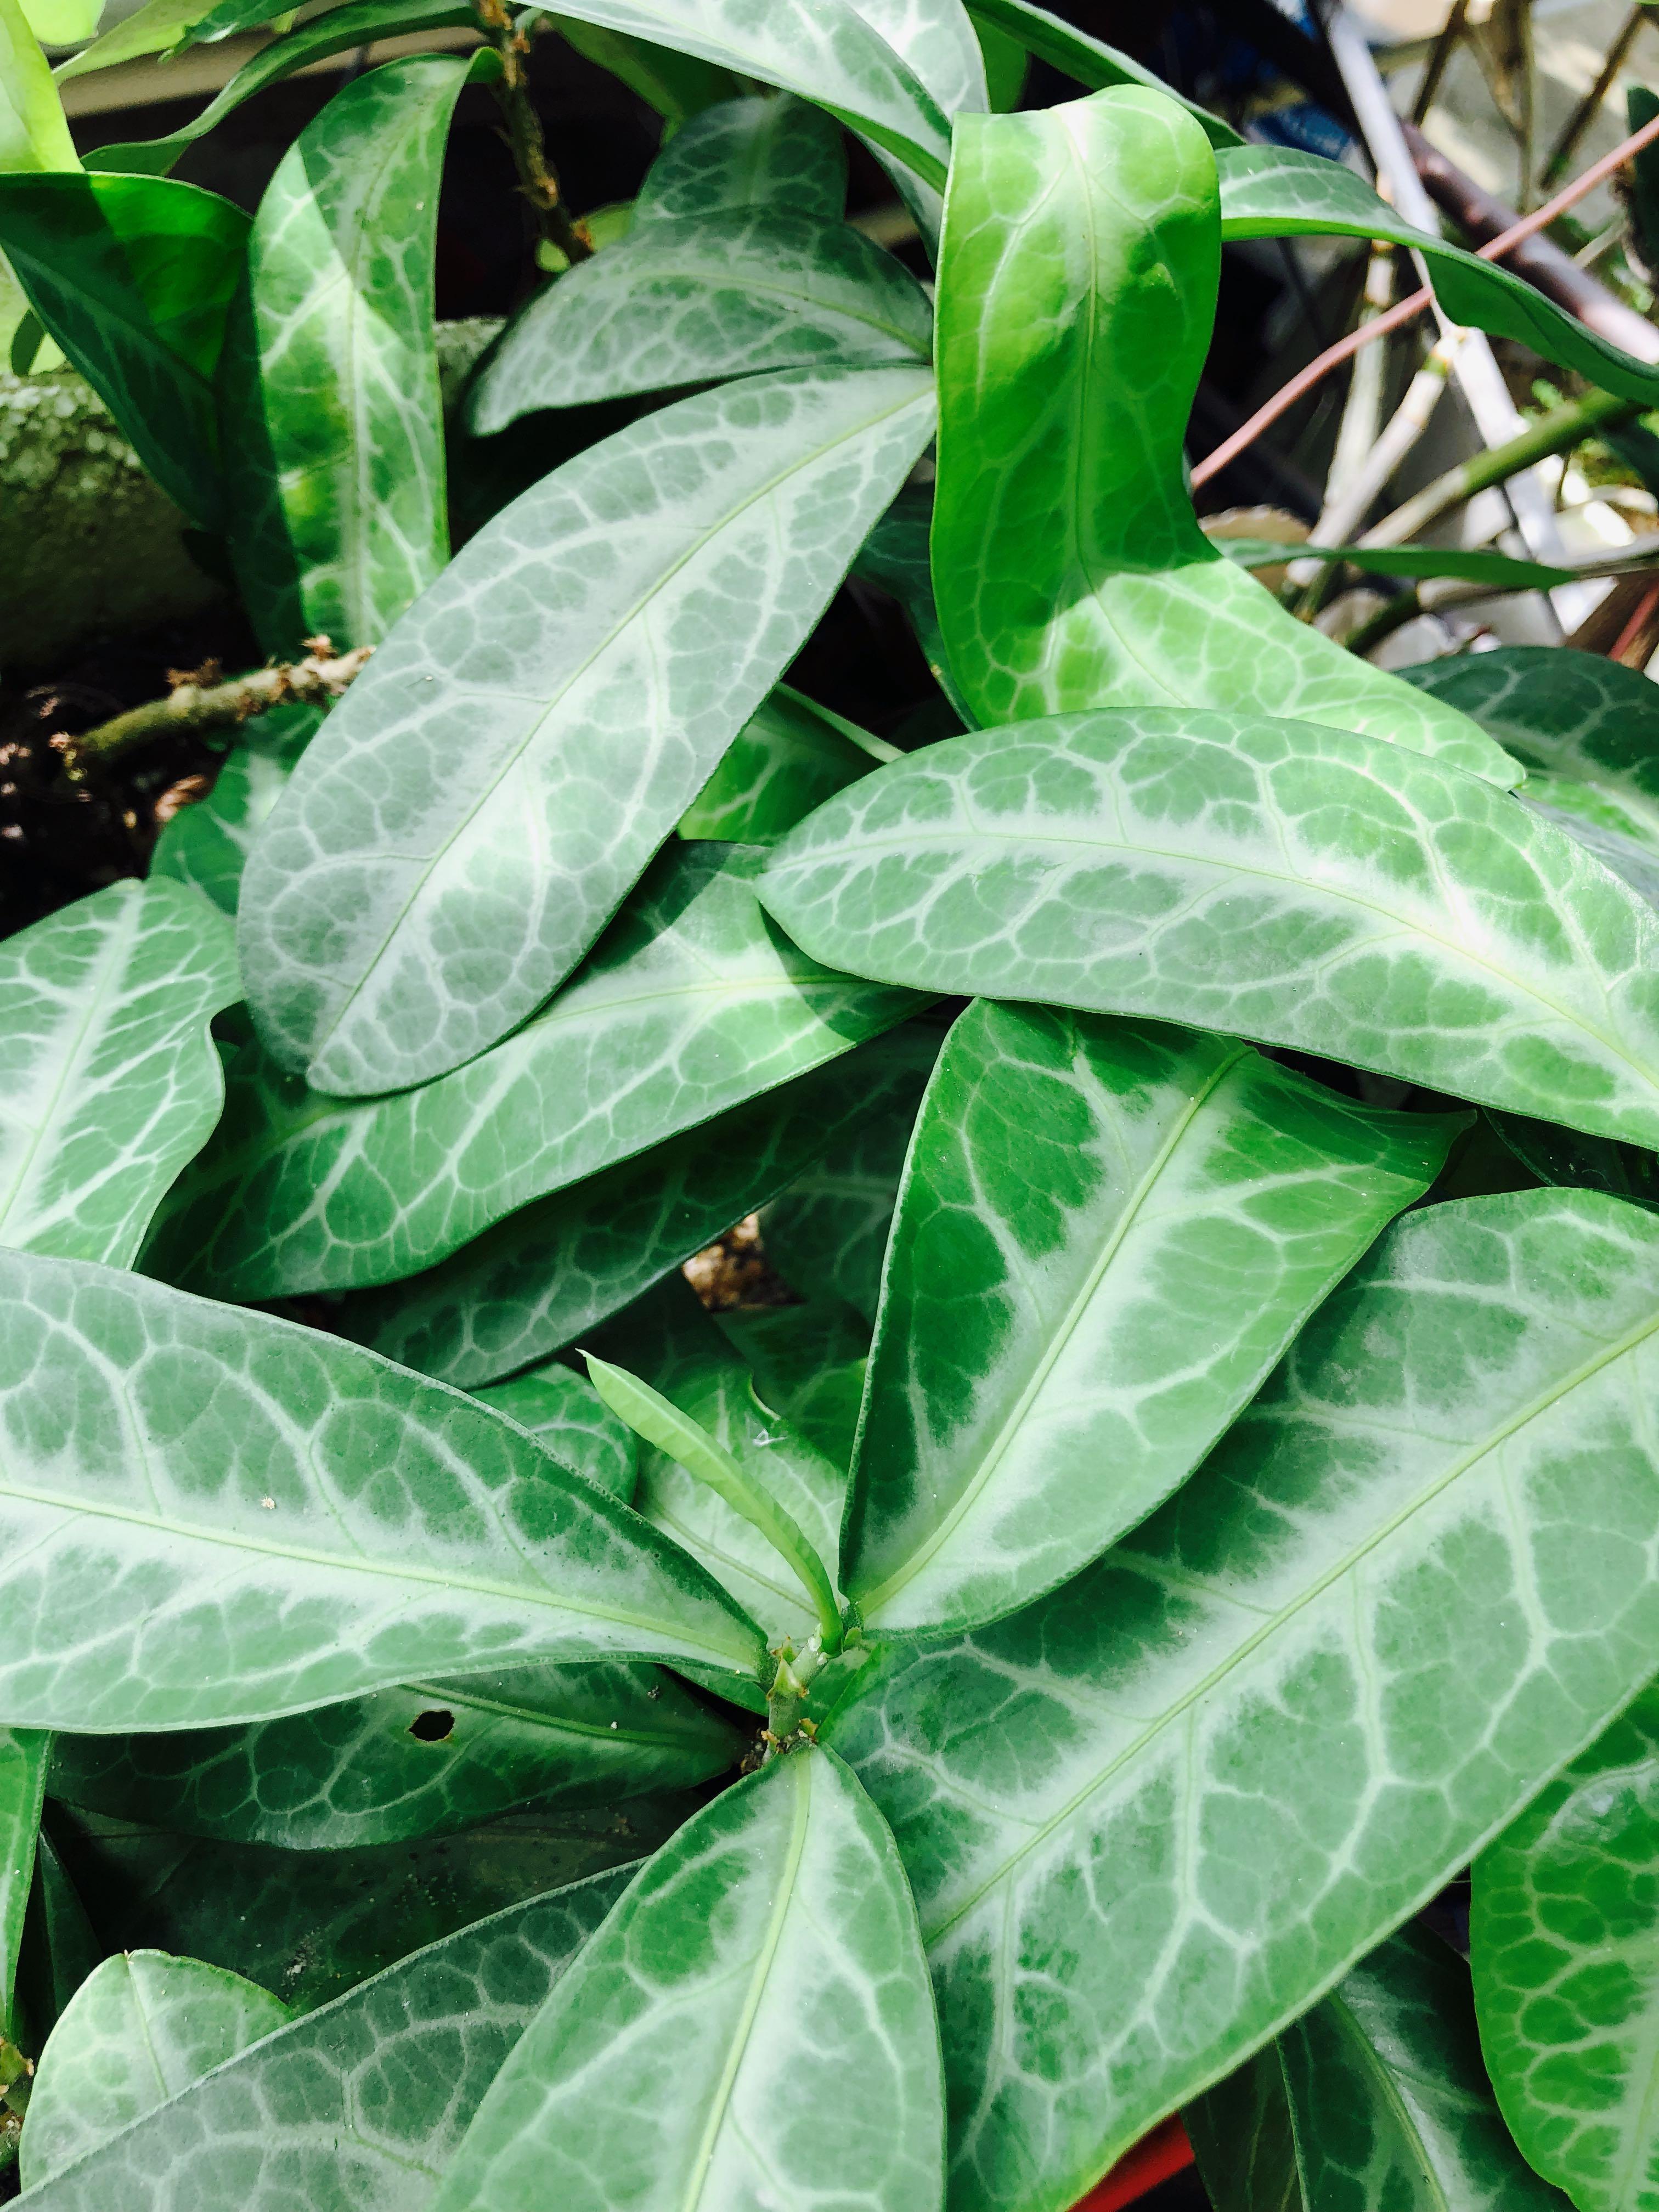 Plant 🌱 新鮮龍脷葉 龍利葉 有機種植 煲湯 植物 Sauropi Folium chinese medicine 化痰止咳 清熱潤肺